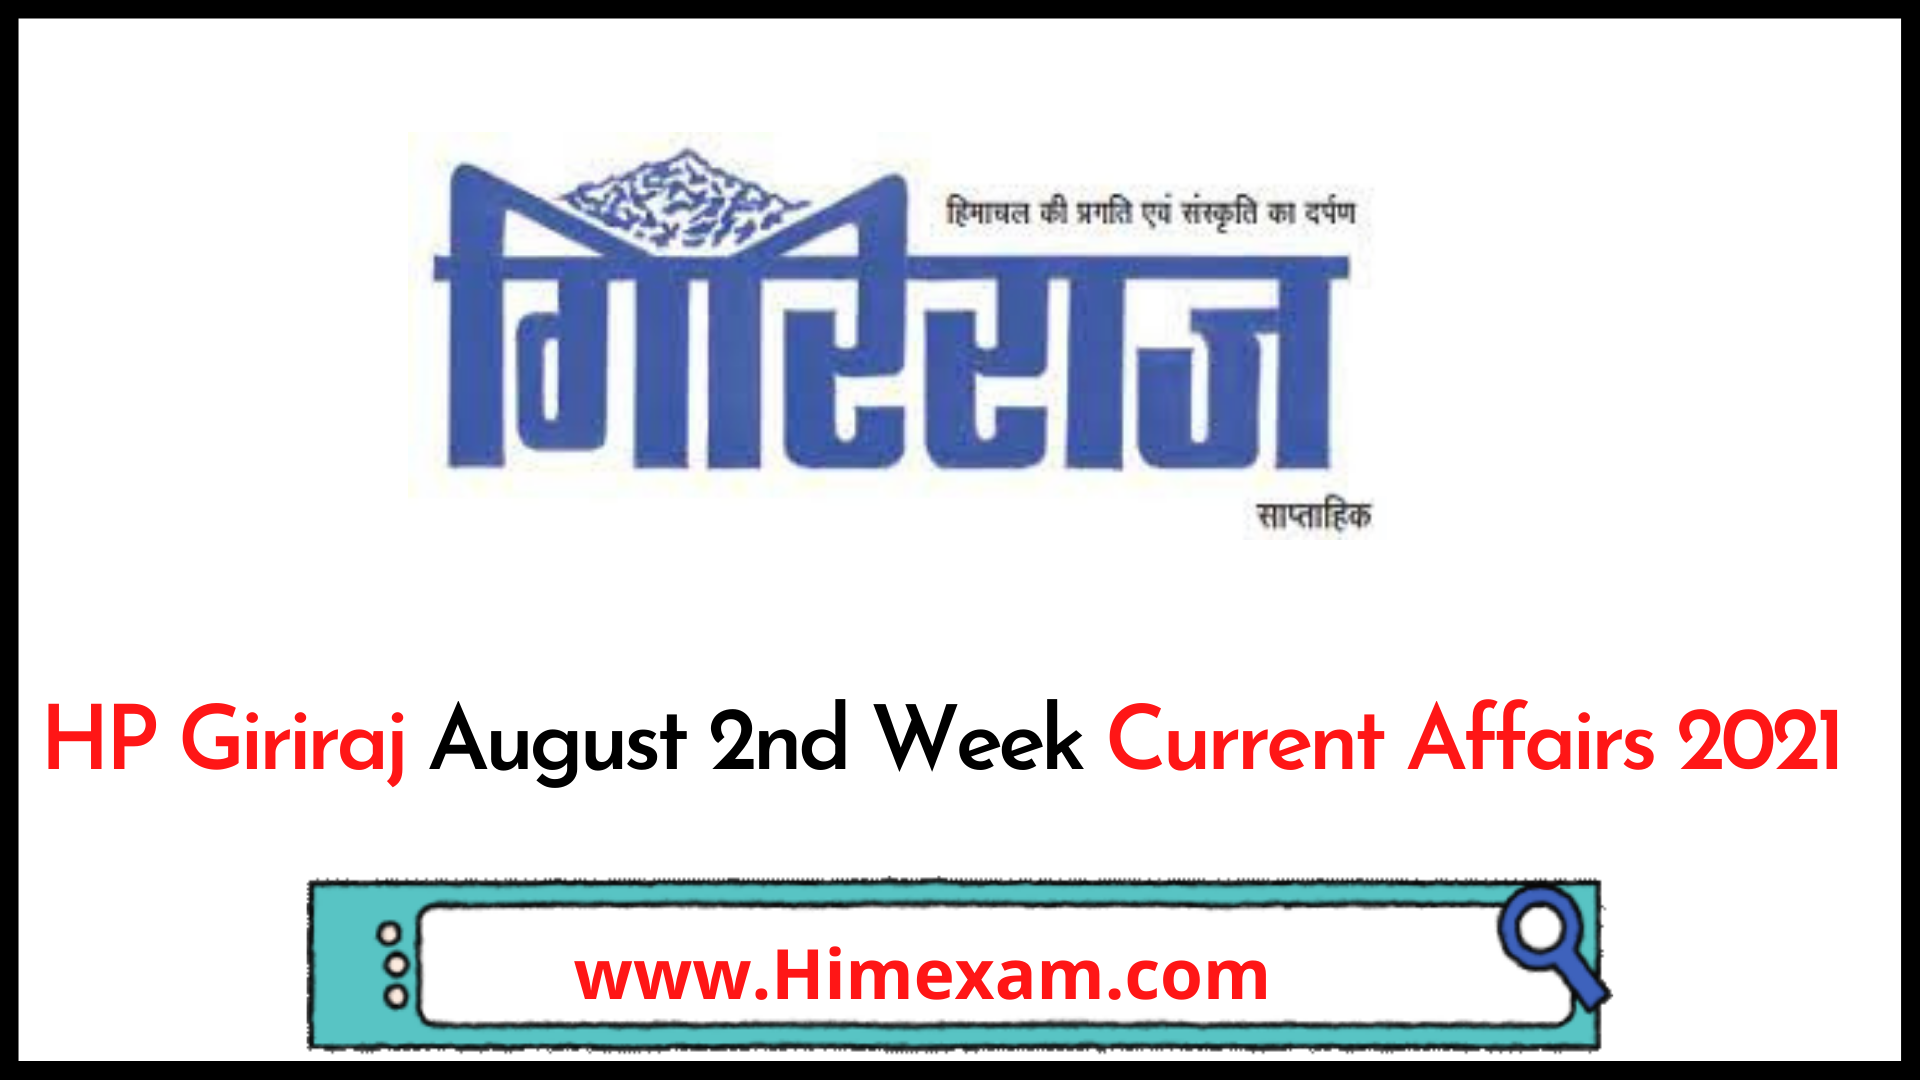 HP Giriraj August 2nd Week Current Affairs 2021